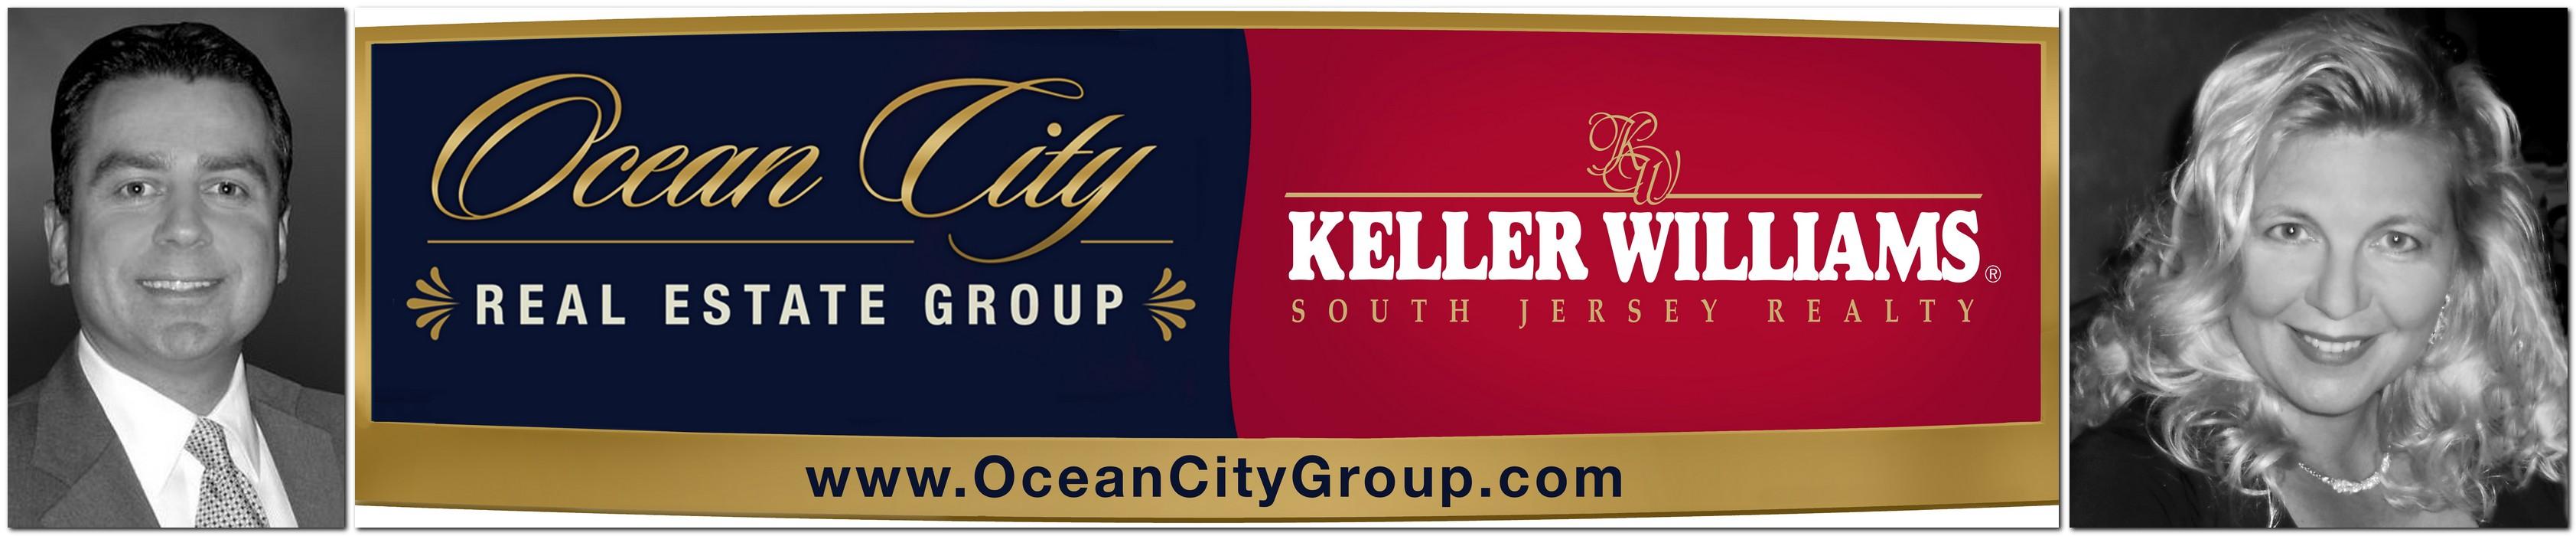 Keller Williams Realty, Keller Williams, South Jersey Realty Team, Ocean City NJ Real Estate Group